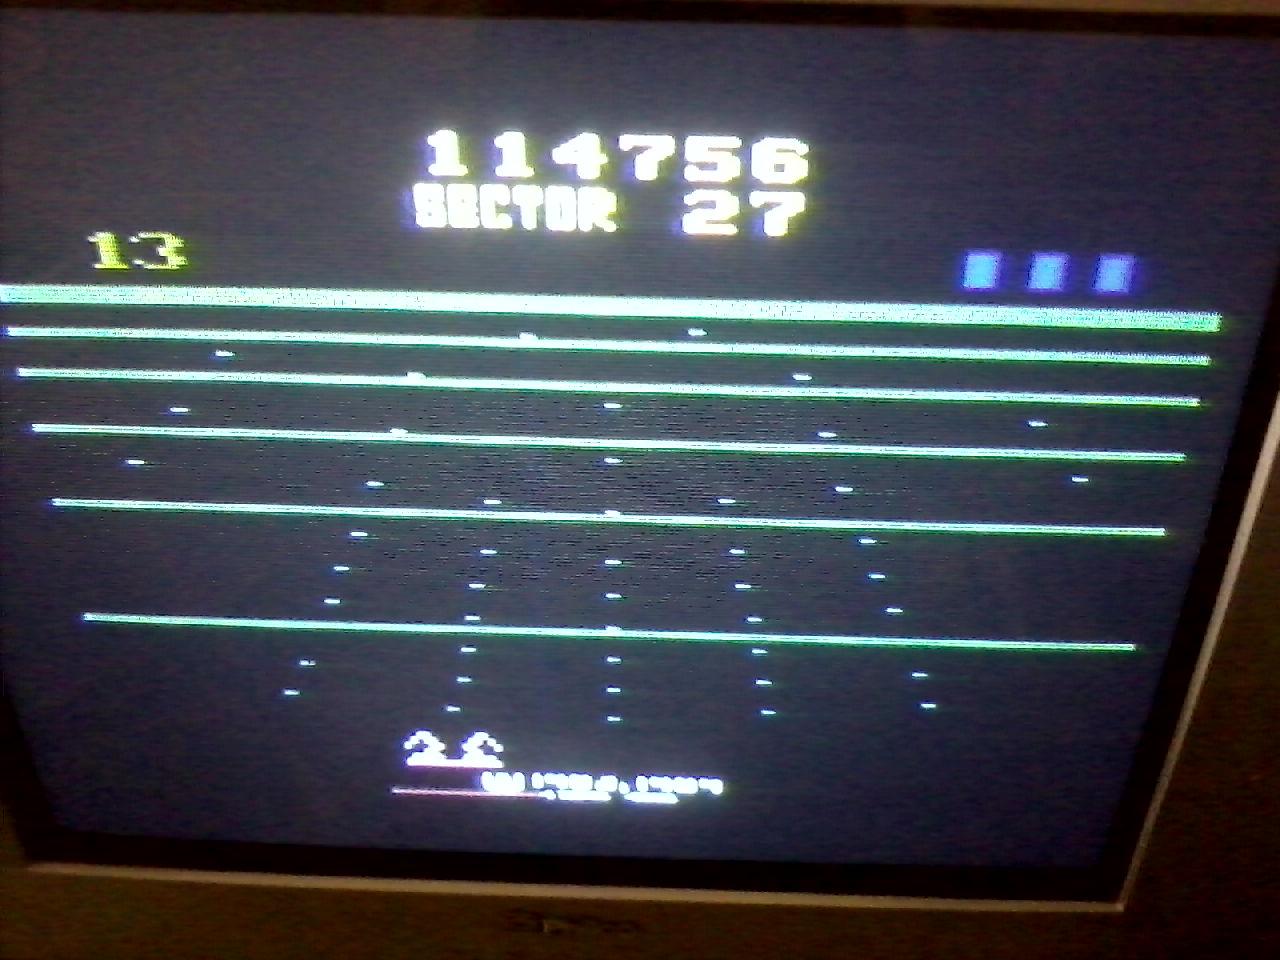 Liduario: Beamrider (Atari 2600 Novice/B) 114,756 points on 2014-03-17 08:23:19